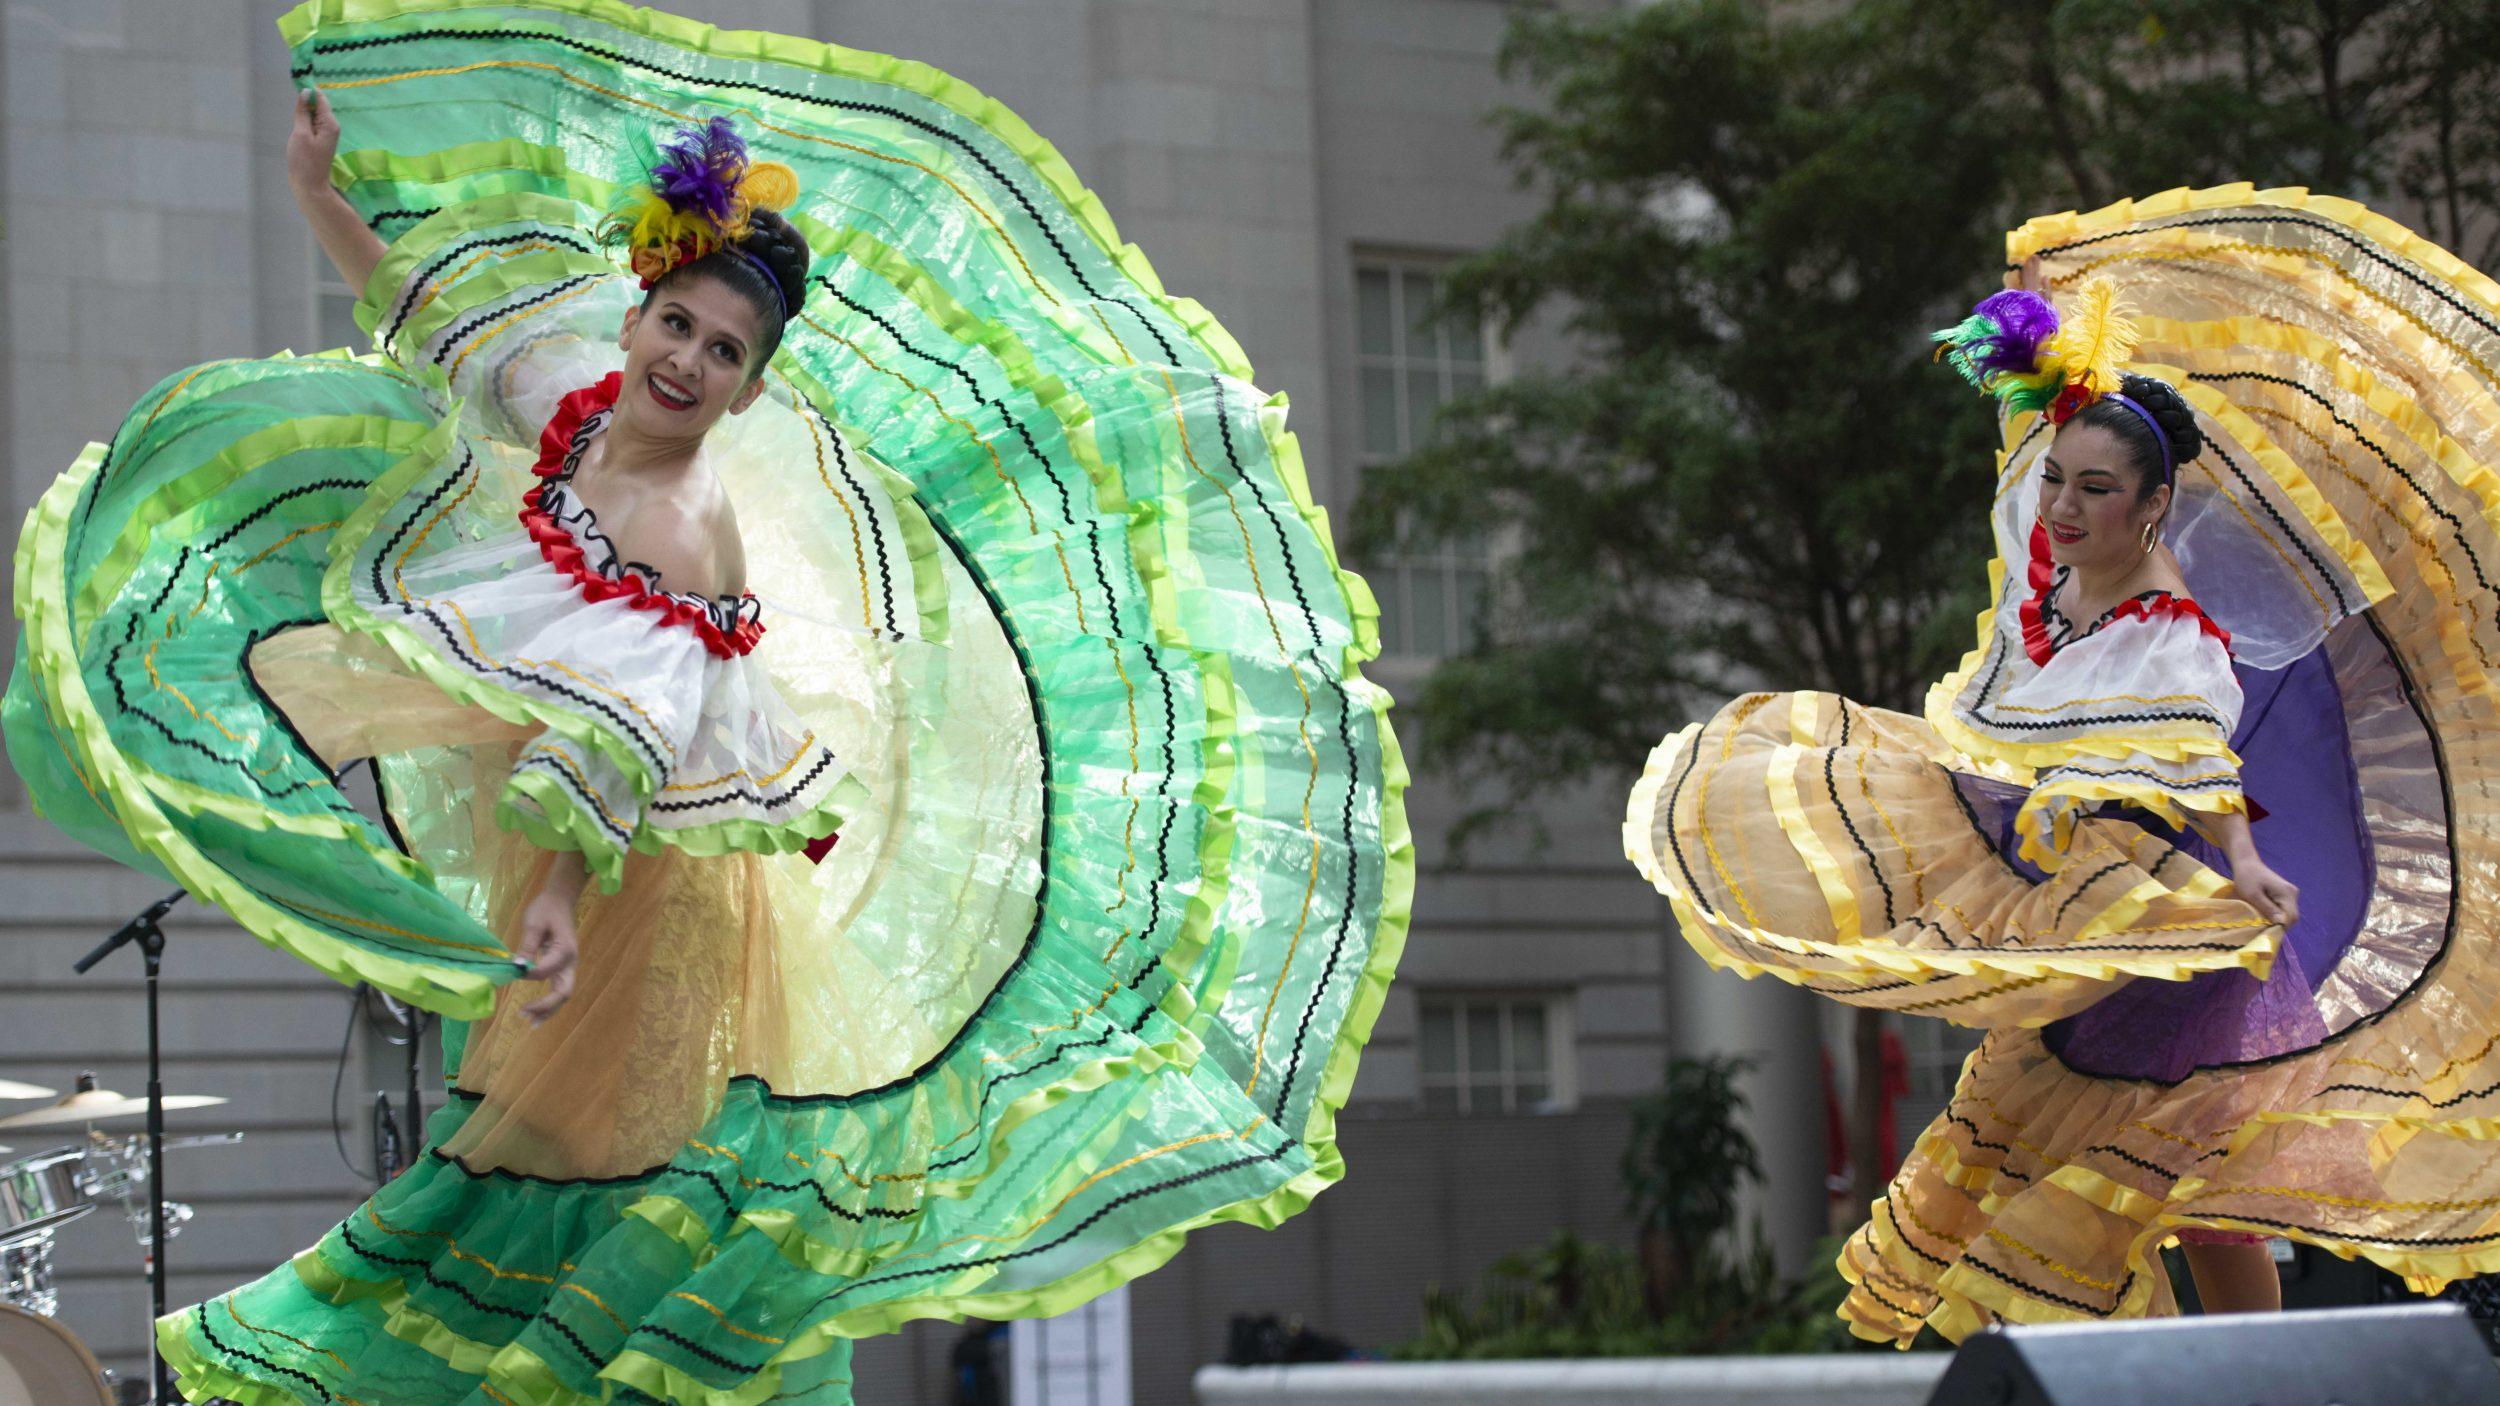 TWB at ¡Muévete! Hispanic Heritage Month Community Day